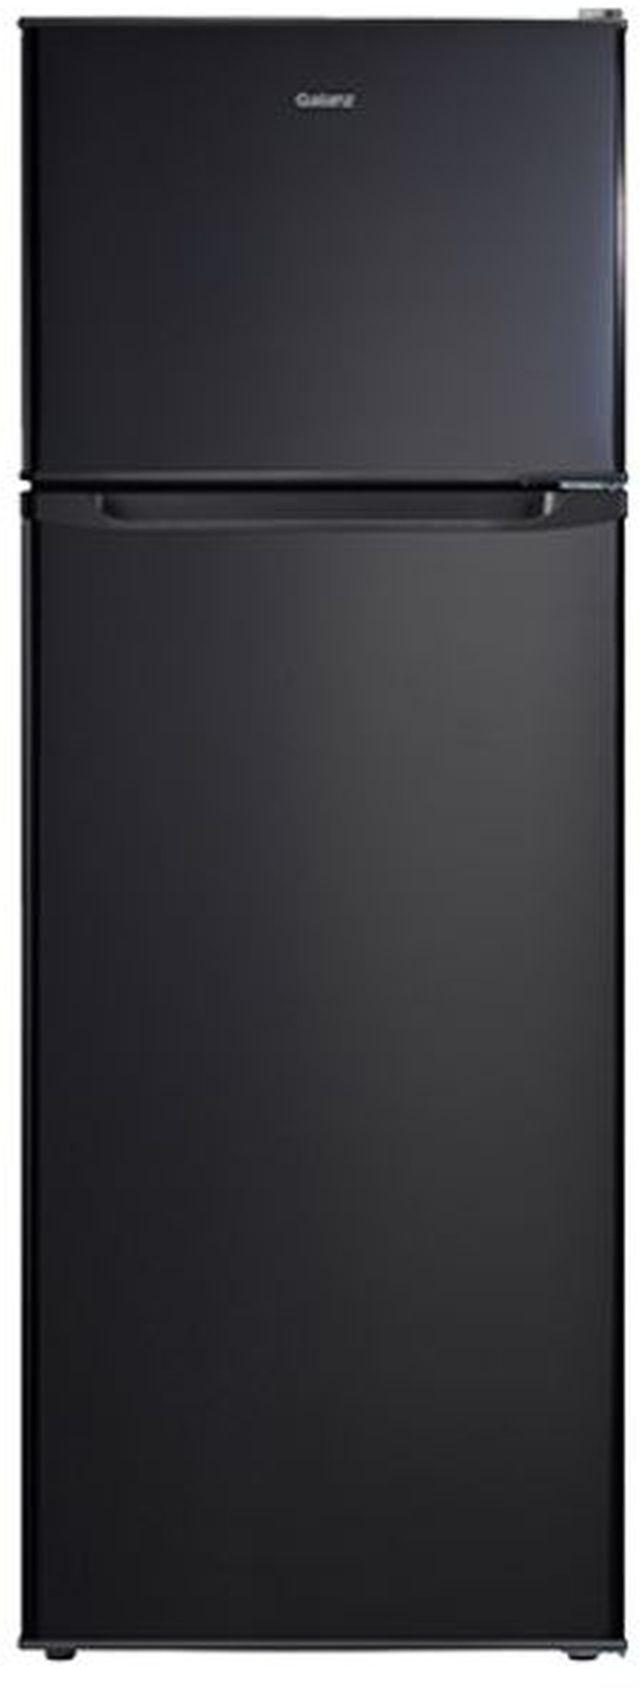 Galanz 12 Cu Ft. Black Top Freezer Refrigerator-GLR12TBKF